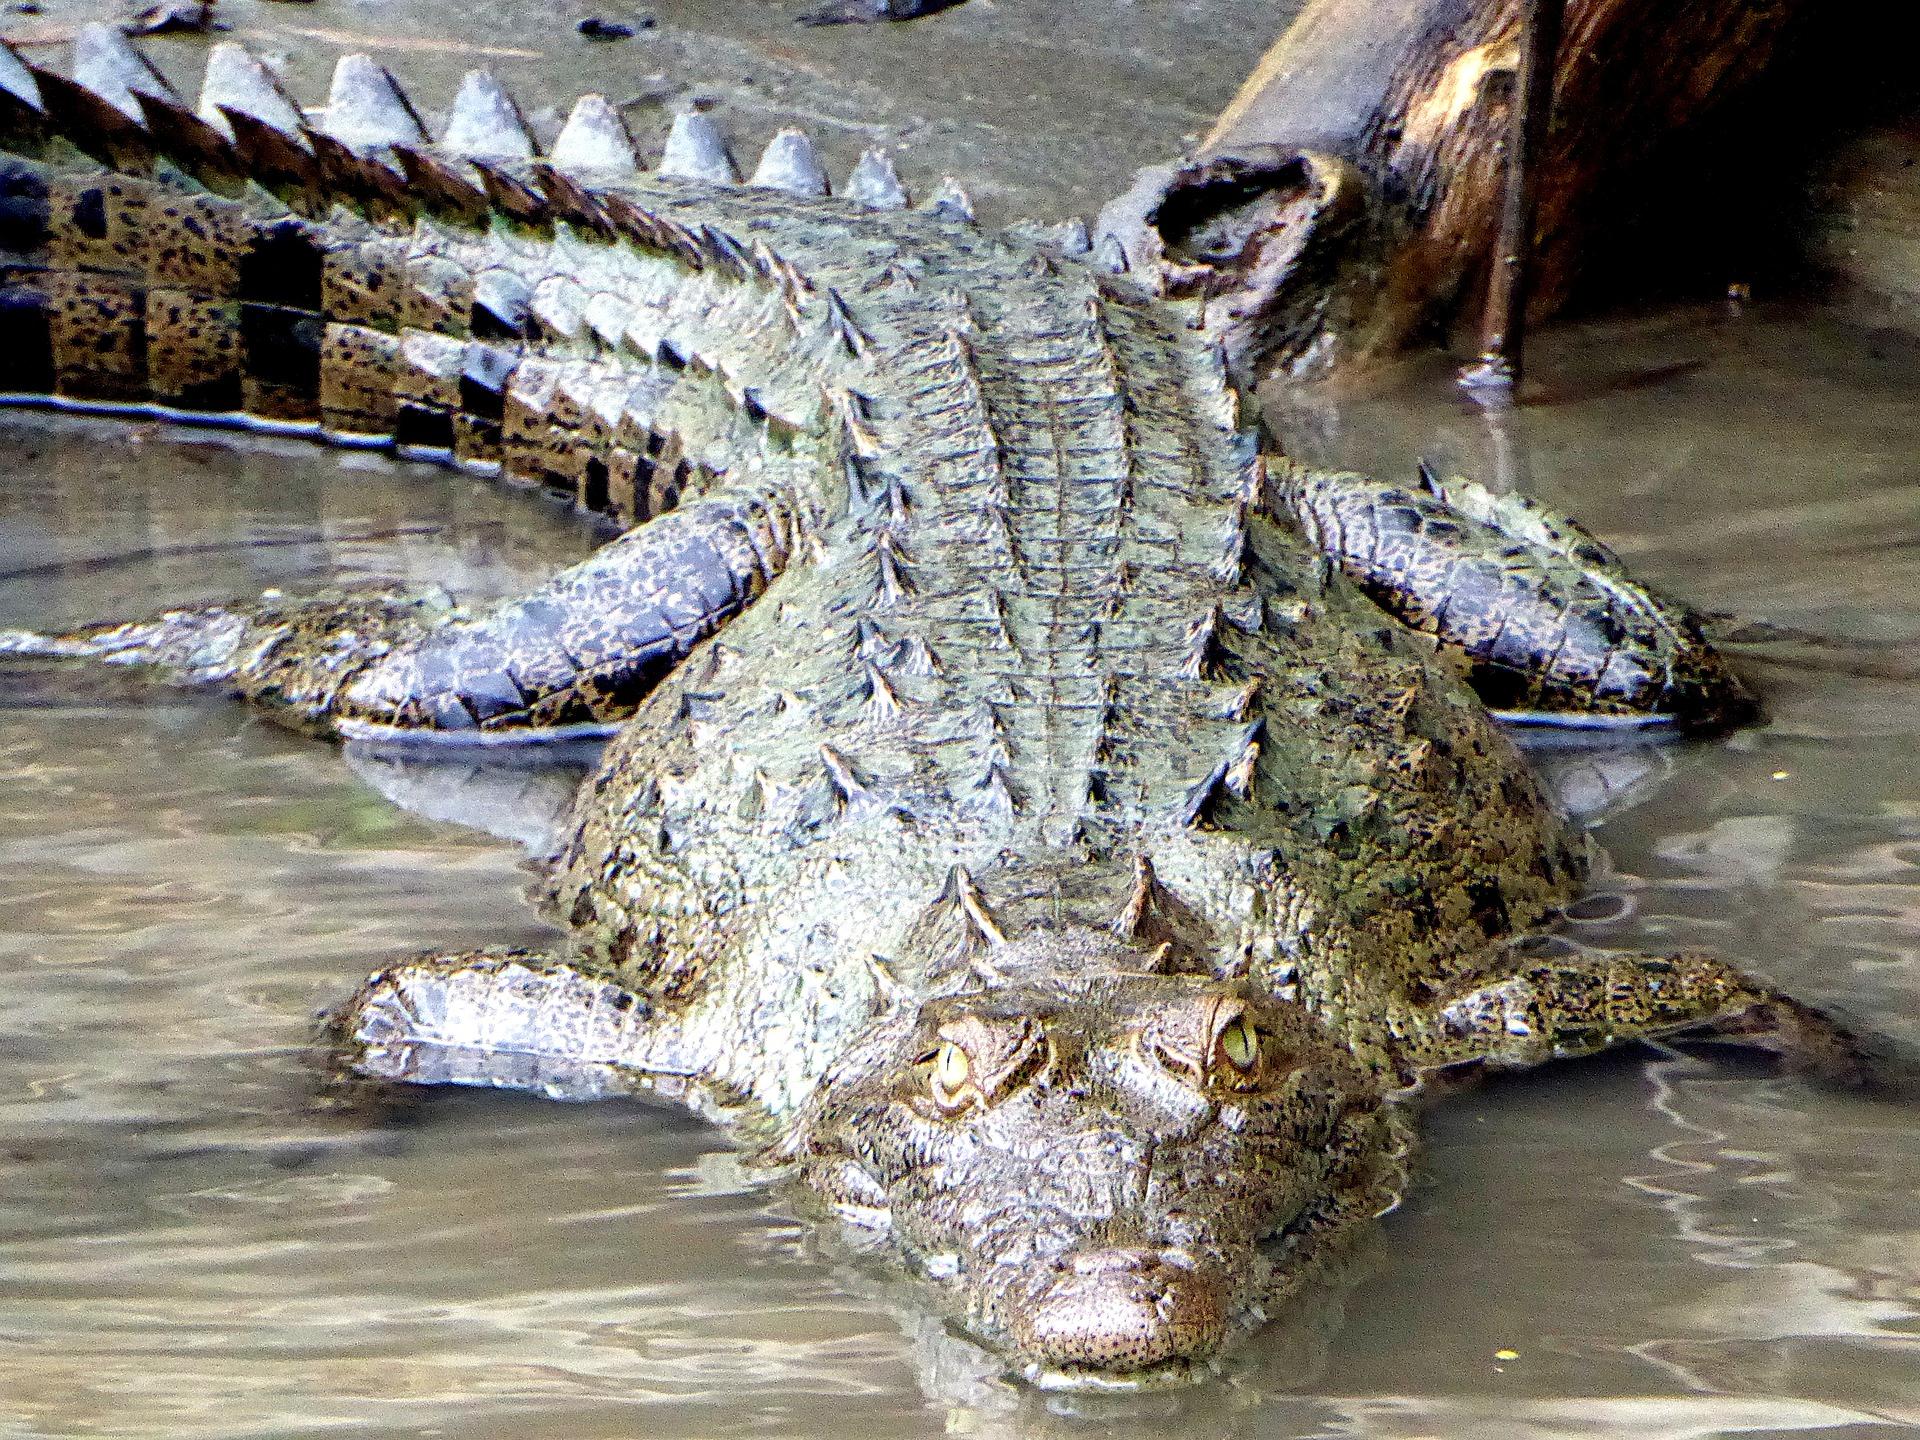 Guatemala wildlife - Caiman